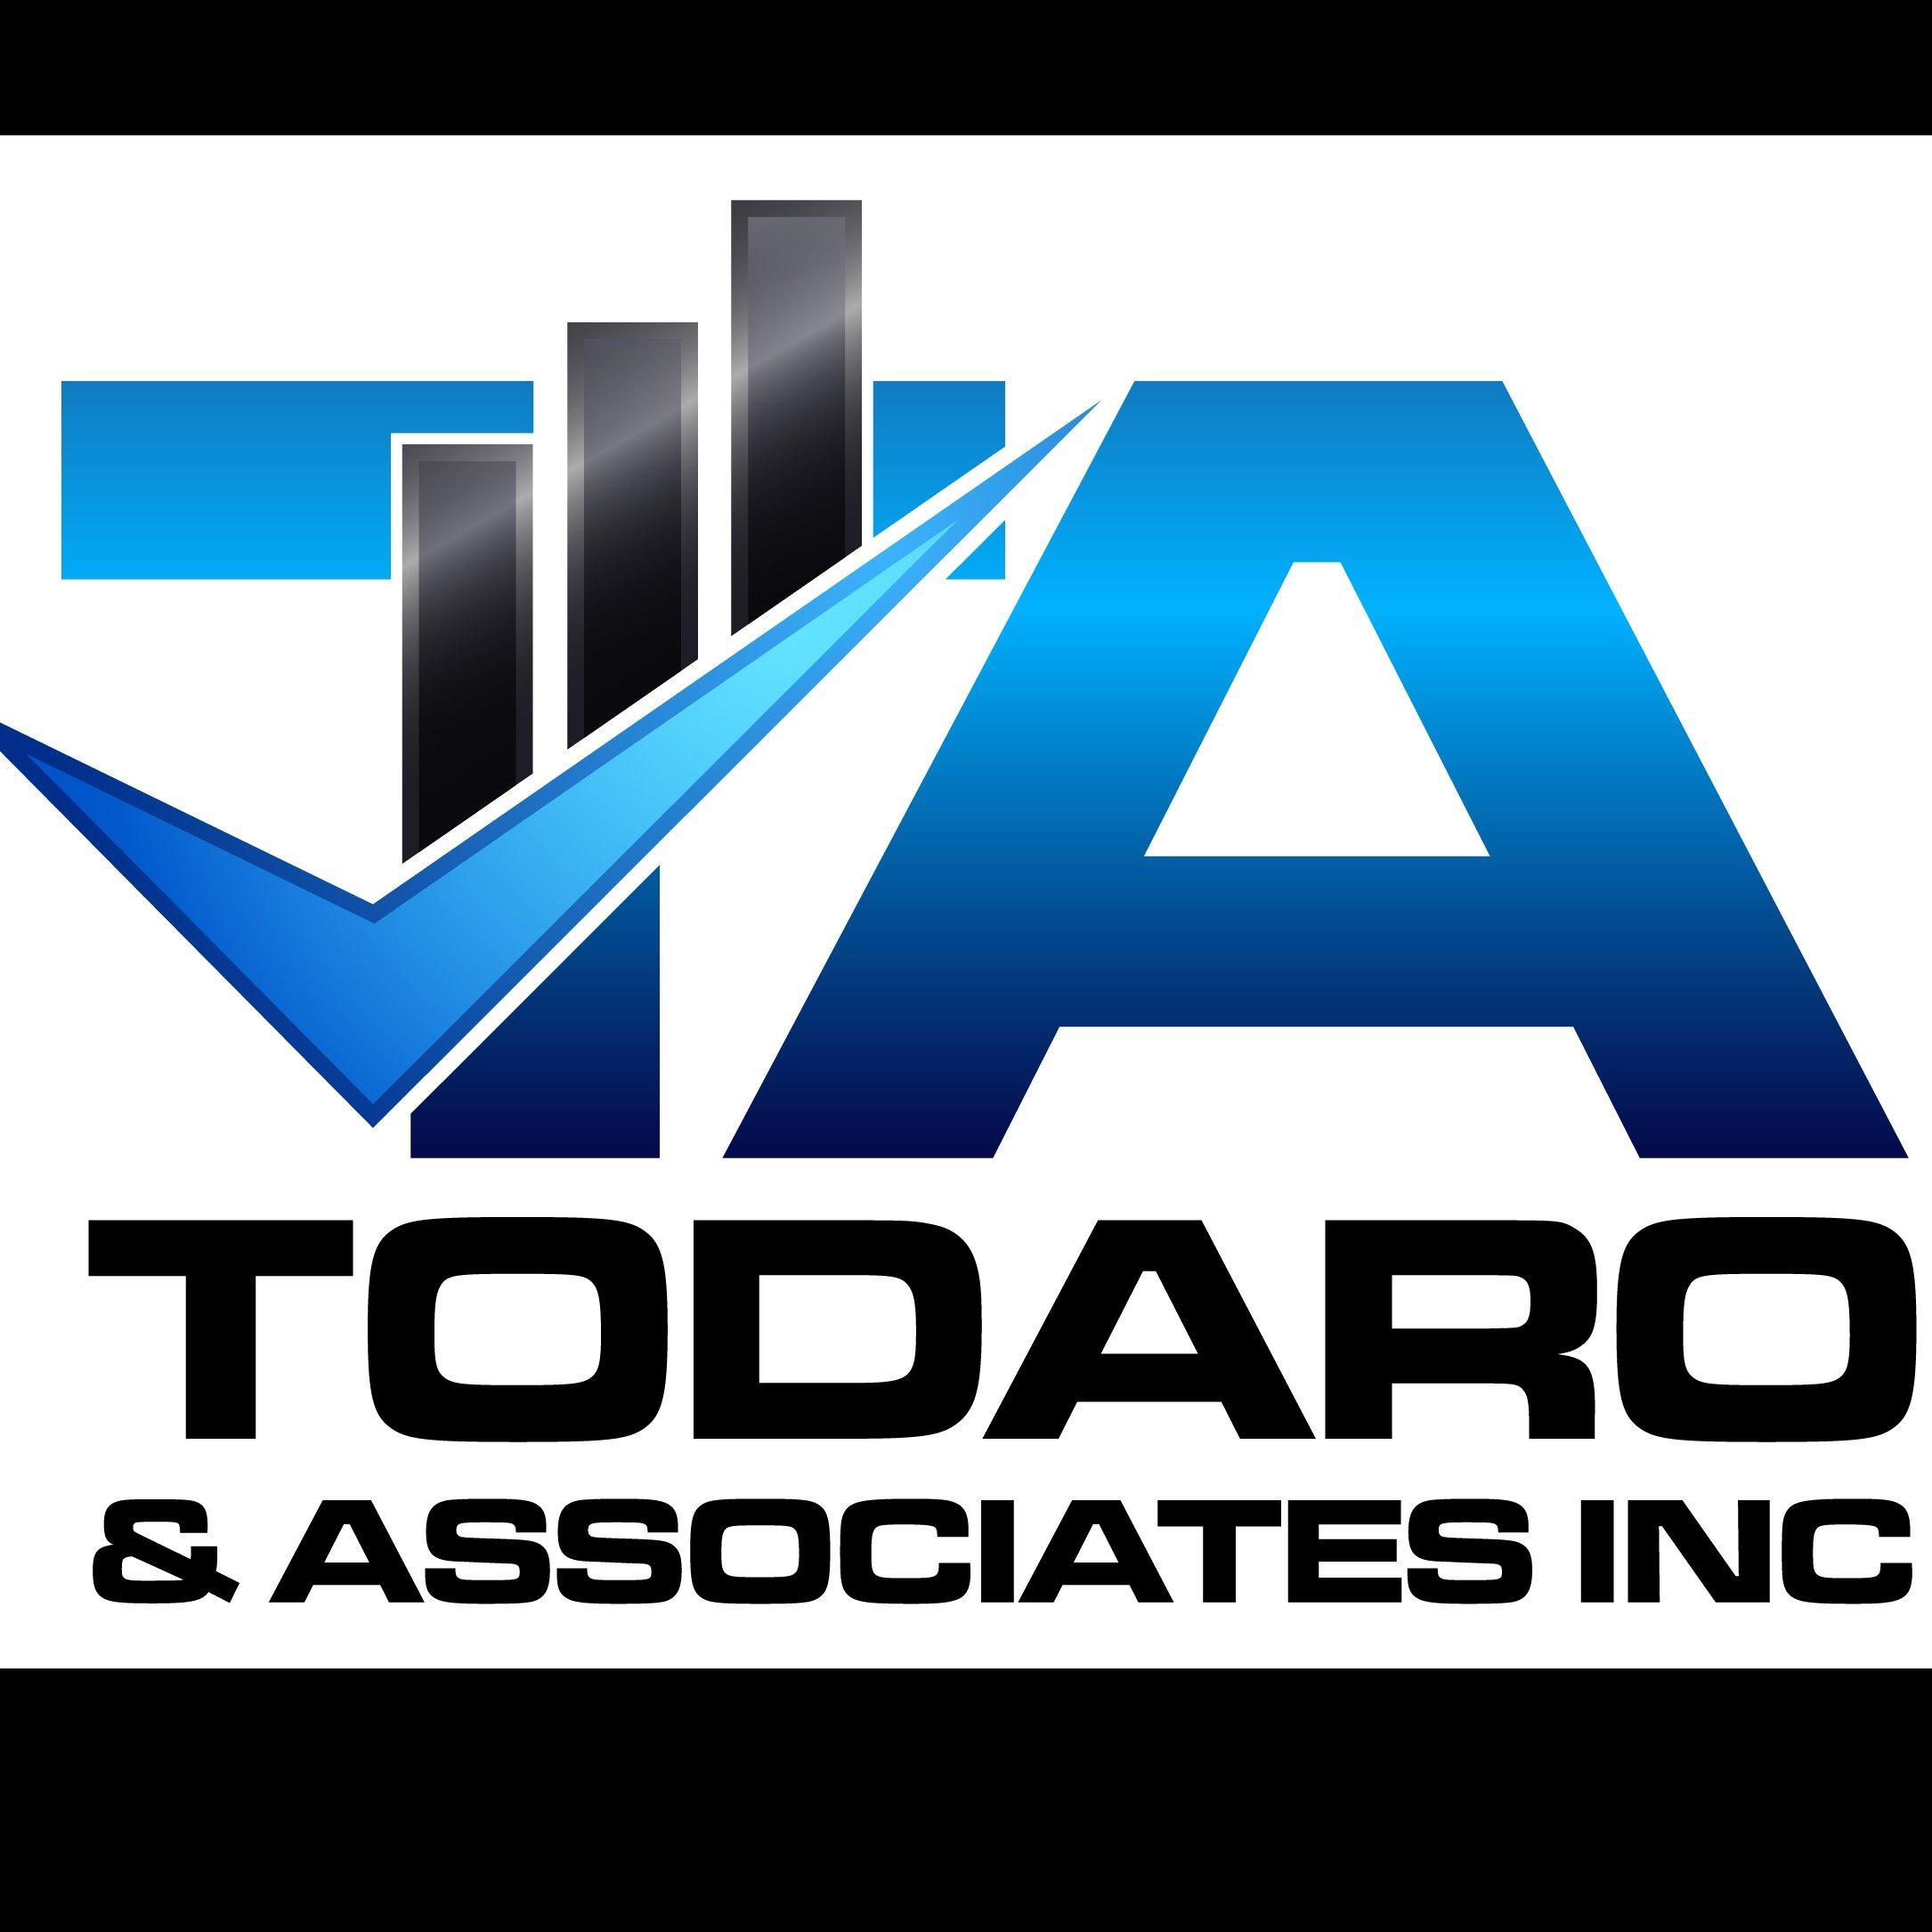 Todaro & Associates Inc.